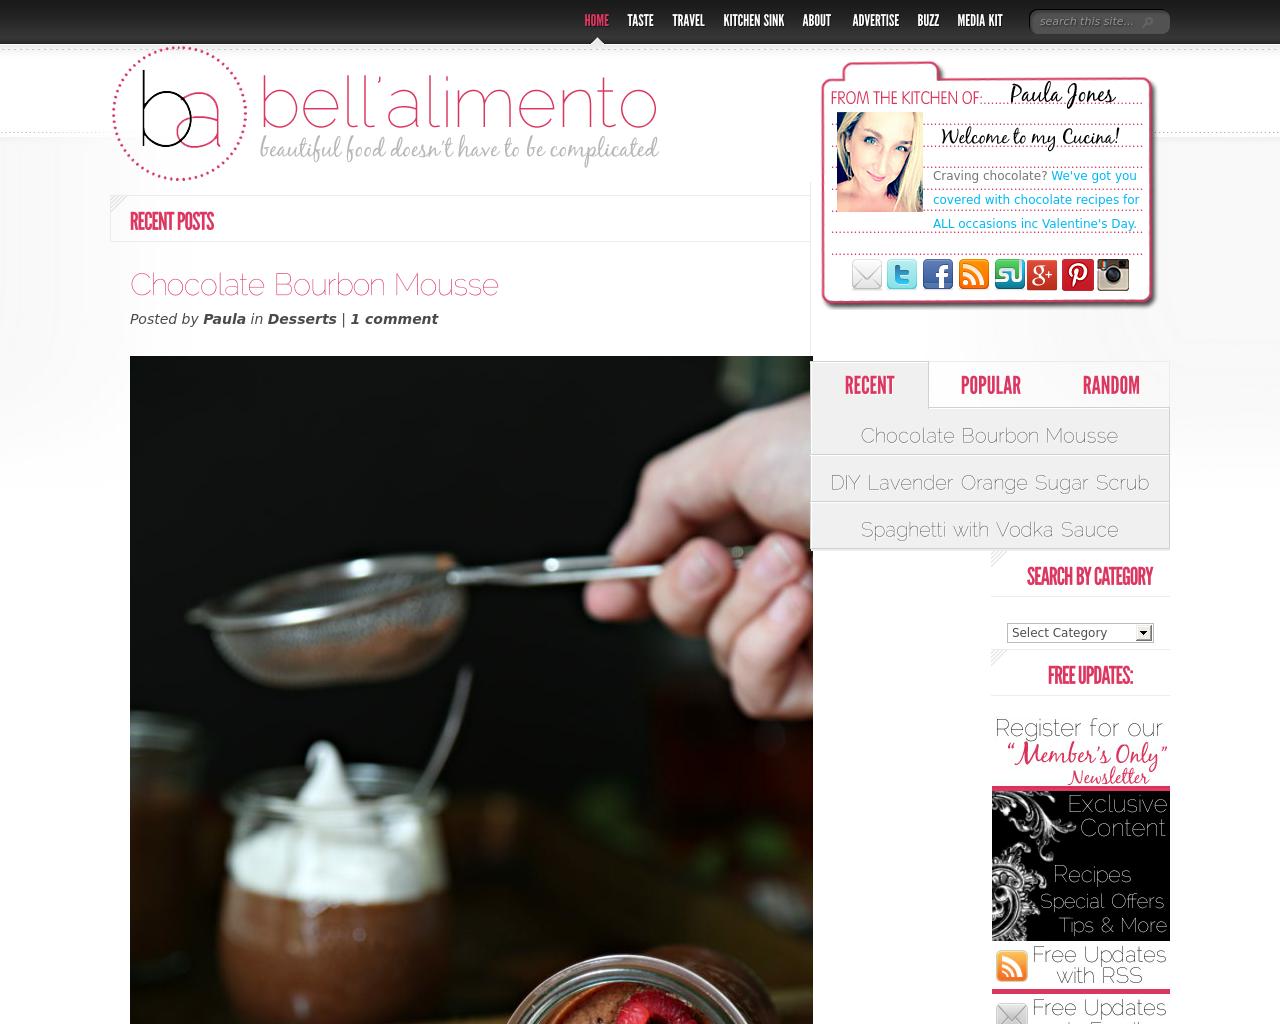 Bellalimento-Advertising-Reviews-Pricing